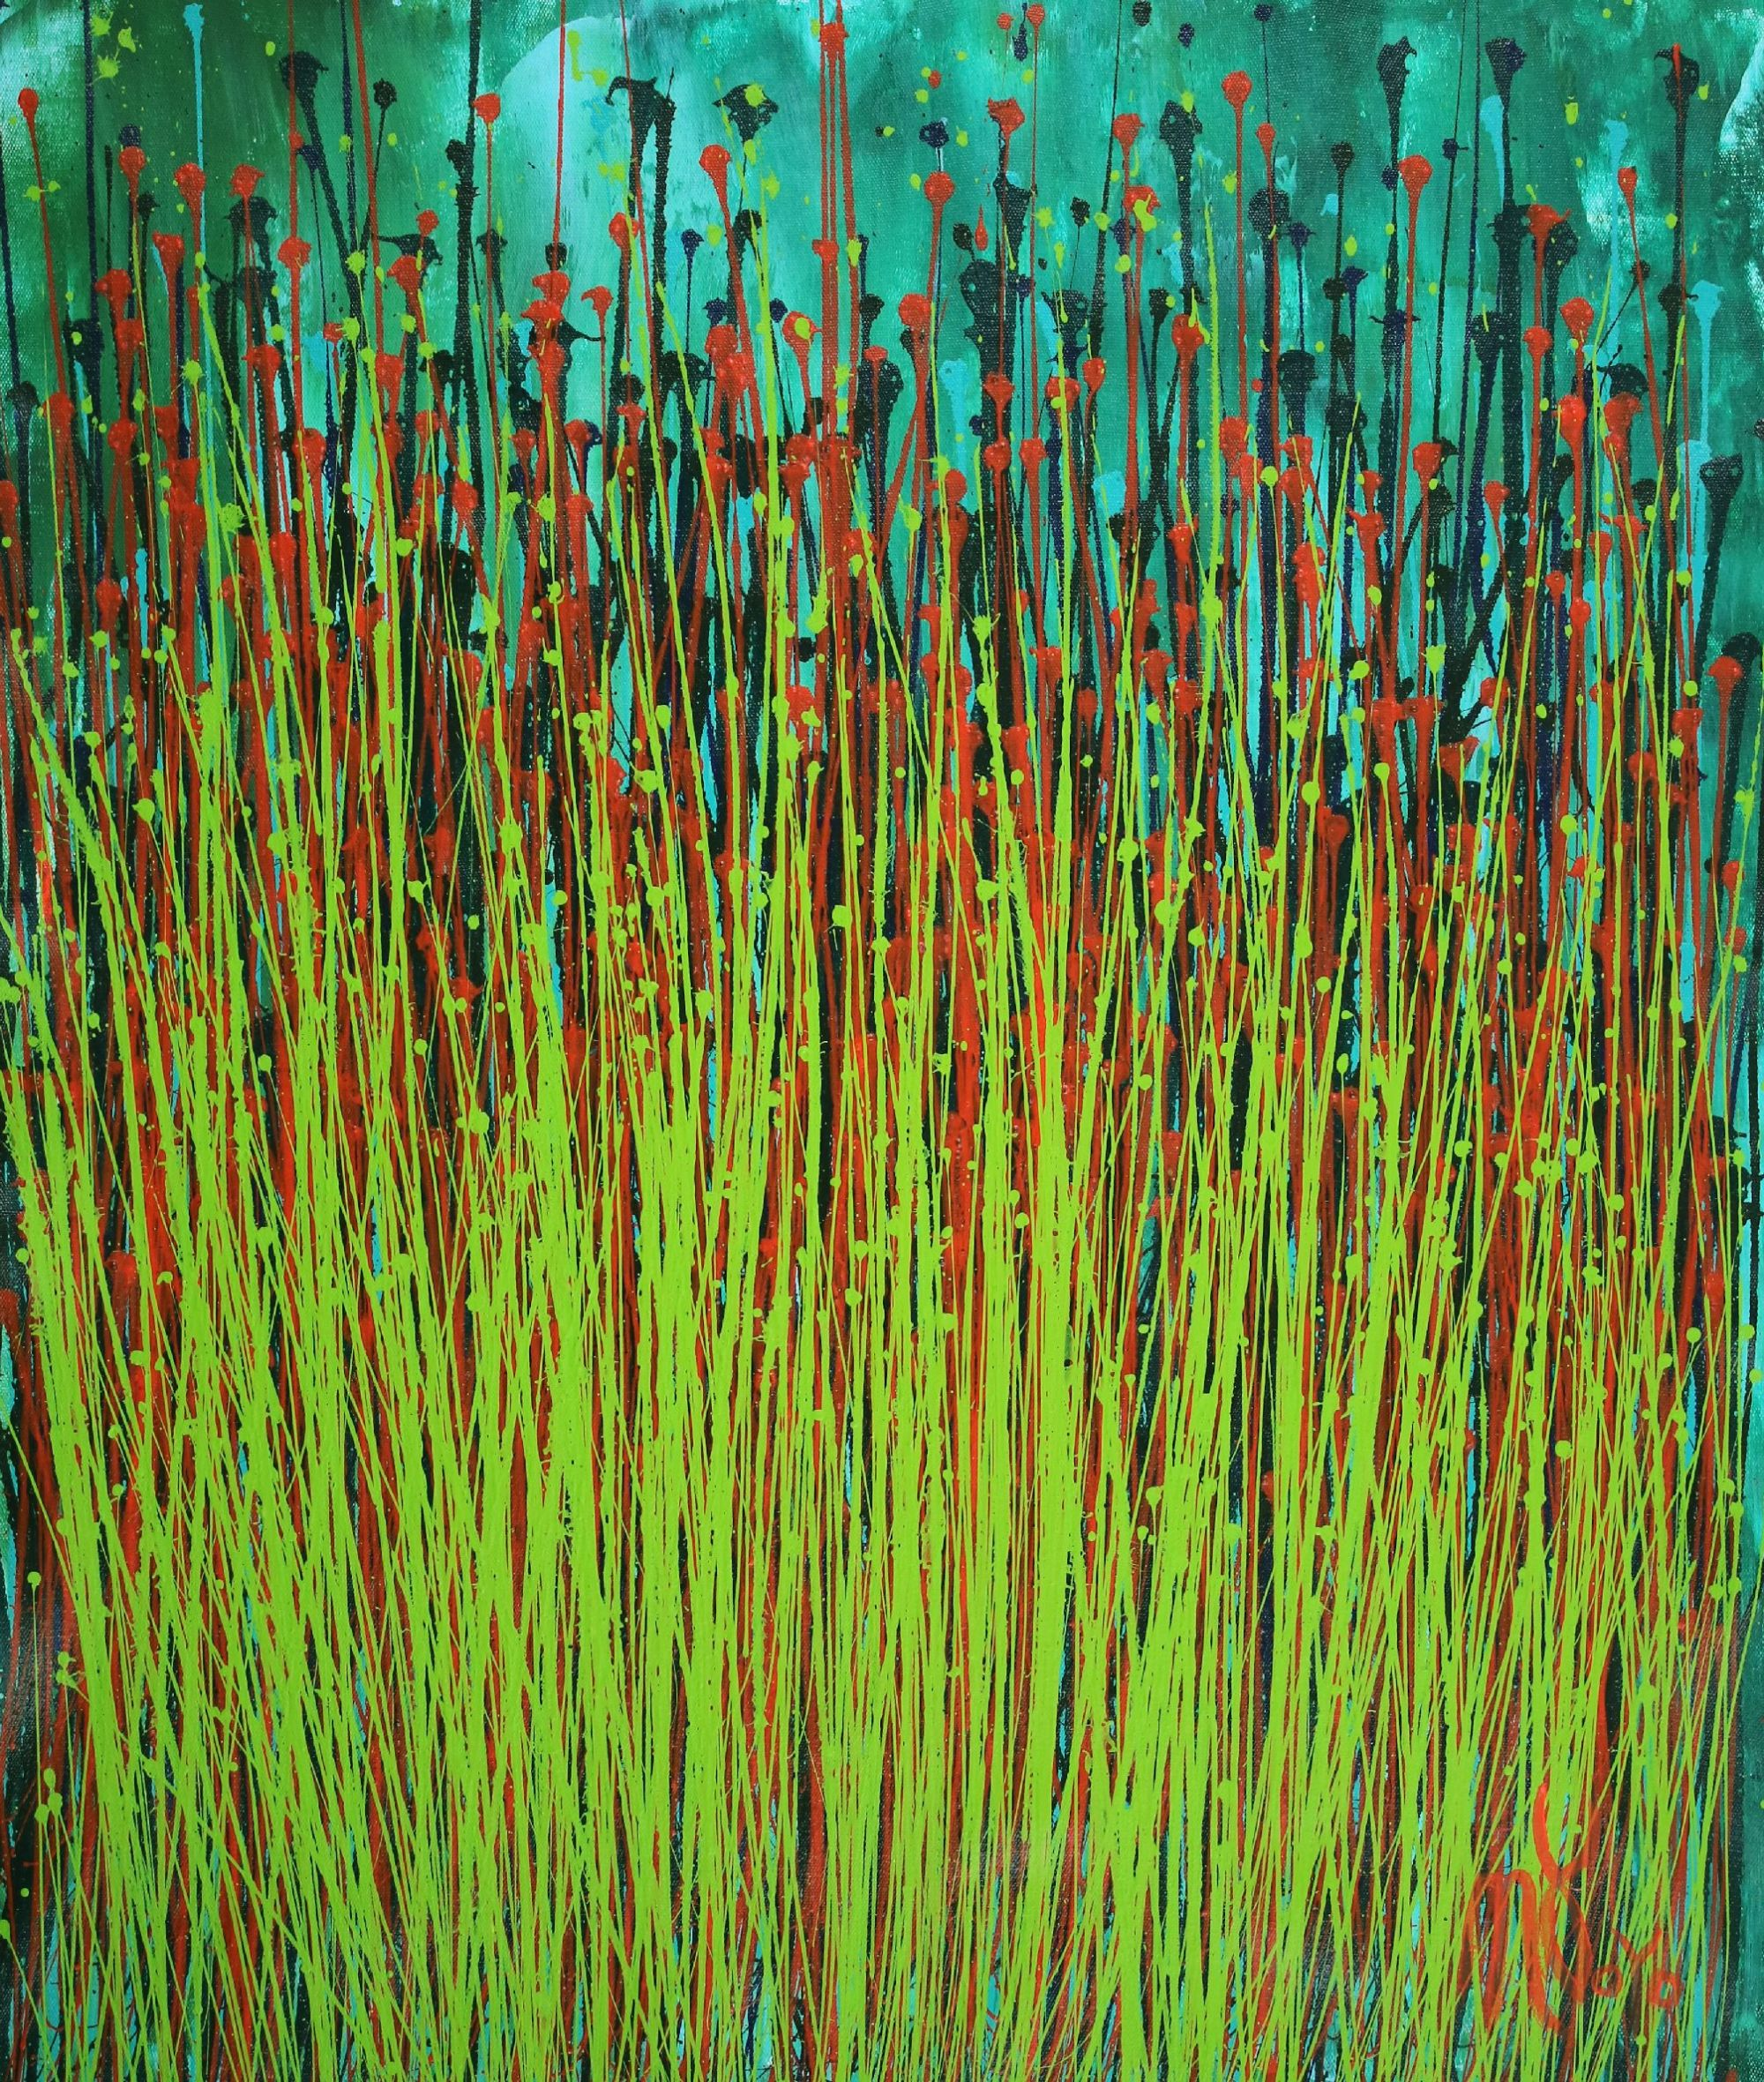 FULL CANVAS - Forest Storm (Green Garden) by Nestor Toro